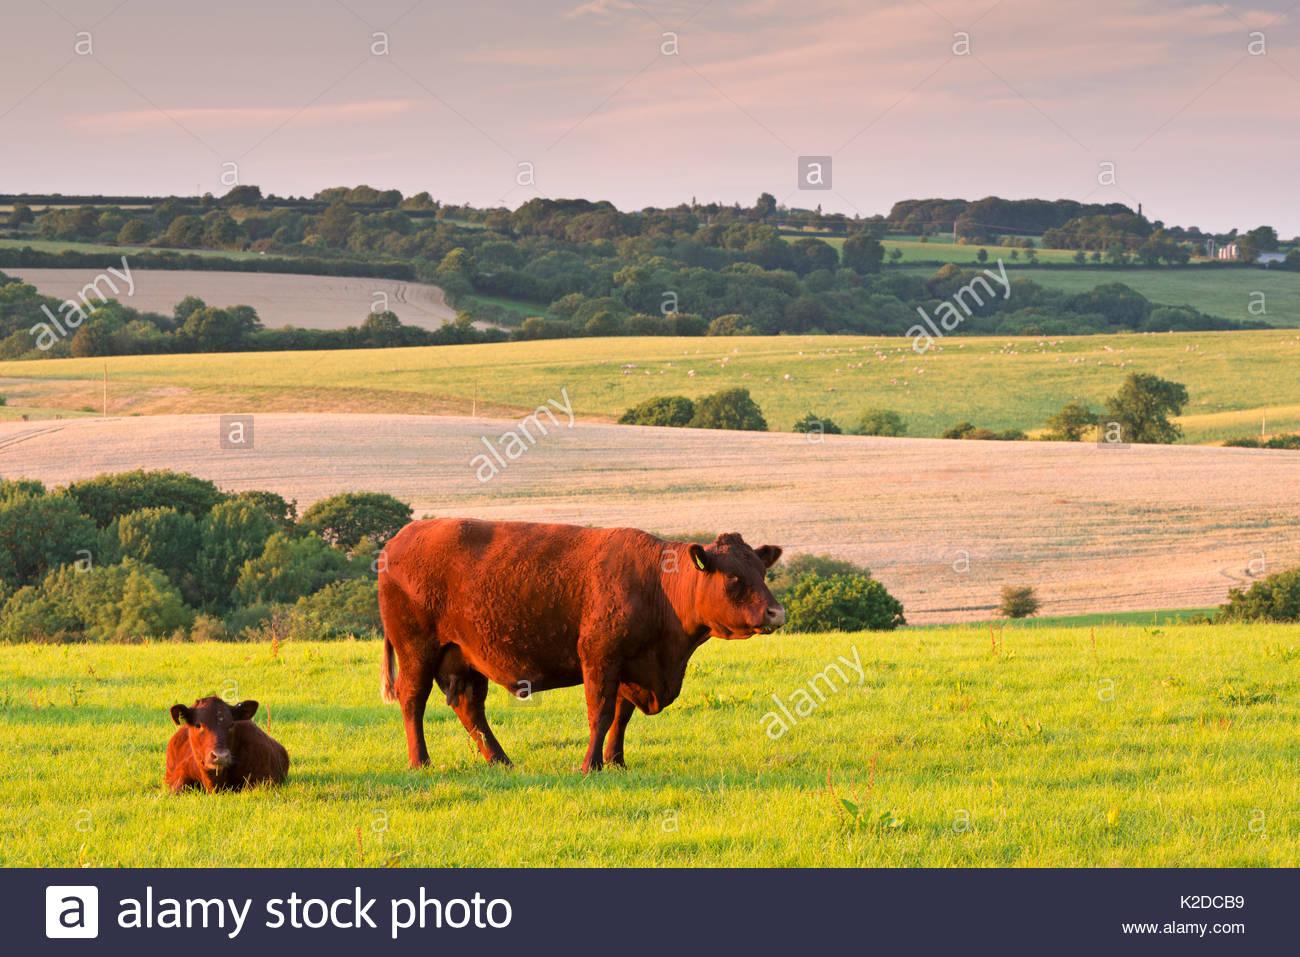 North Devon Red Ruby cattle grazing in summer countryside. Black Dog, Devon, England, UK. July 2014. - Stock Image